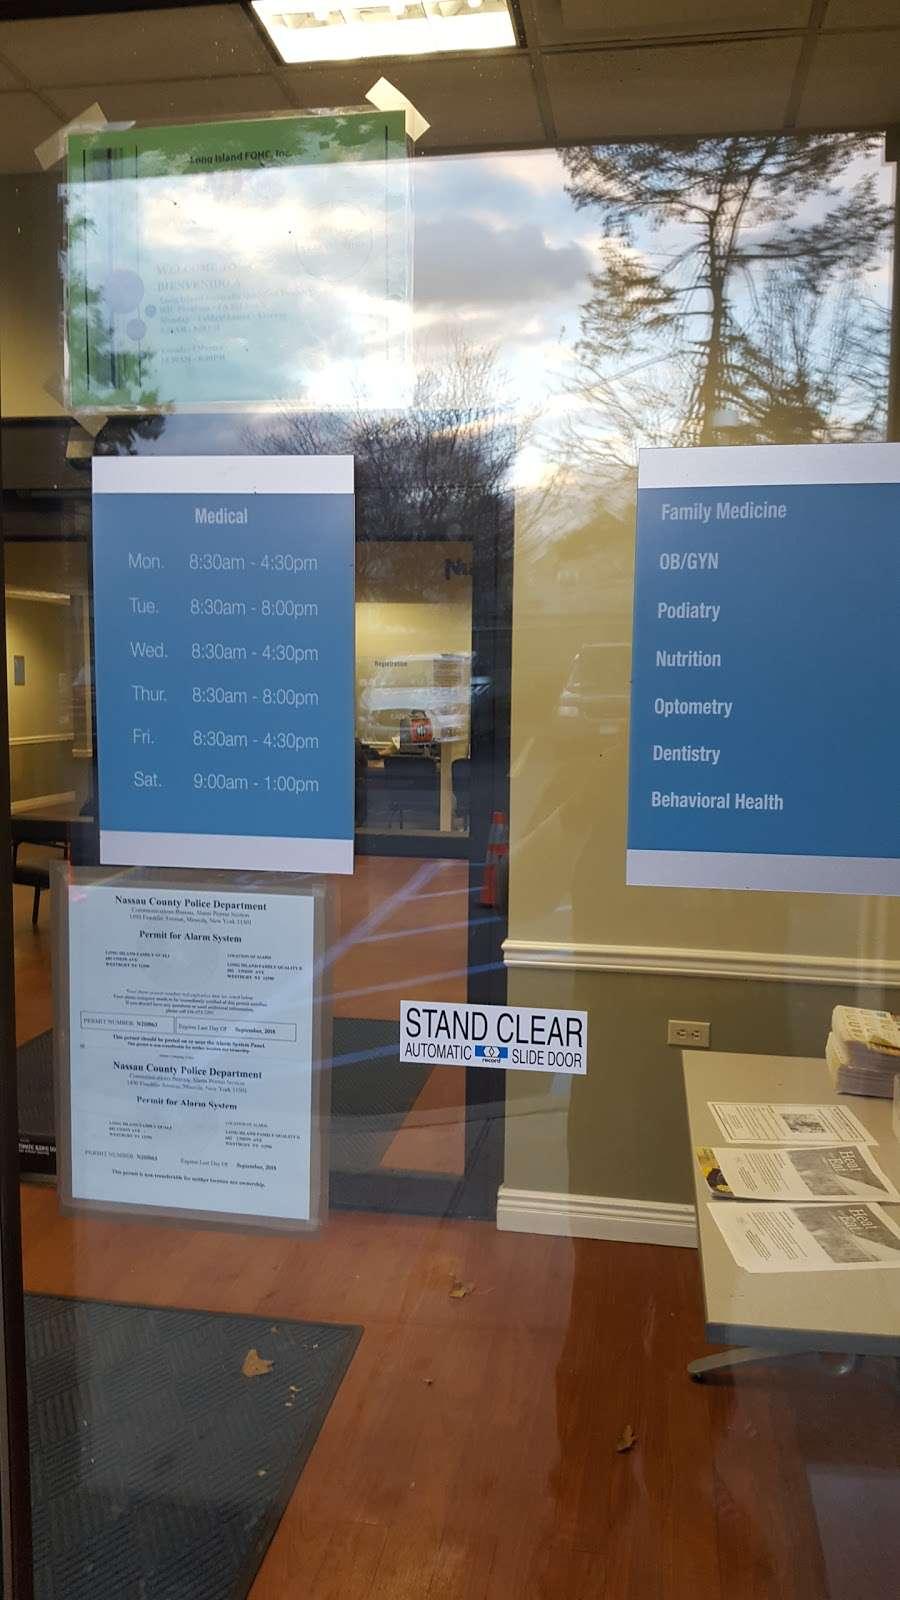 NuHealth Family Health Centers - health  | Photo 5 of 5 | Address: 682 Union Ave, Westbury, NY 11590, USA | Phone: (516) 571-9500